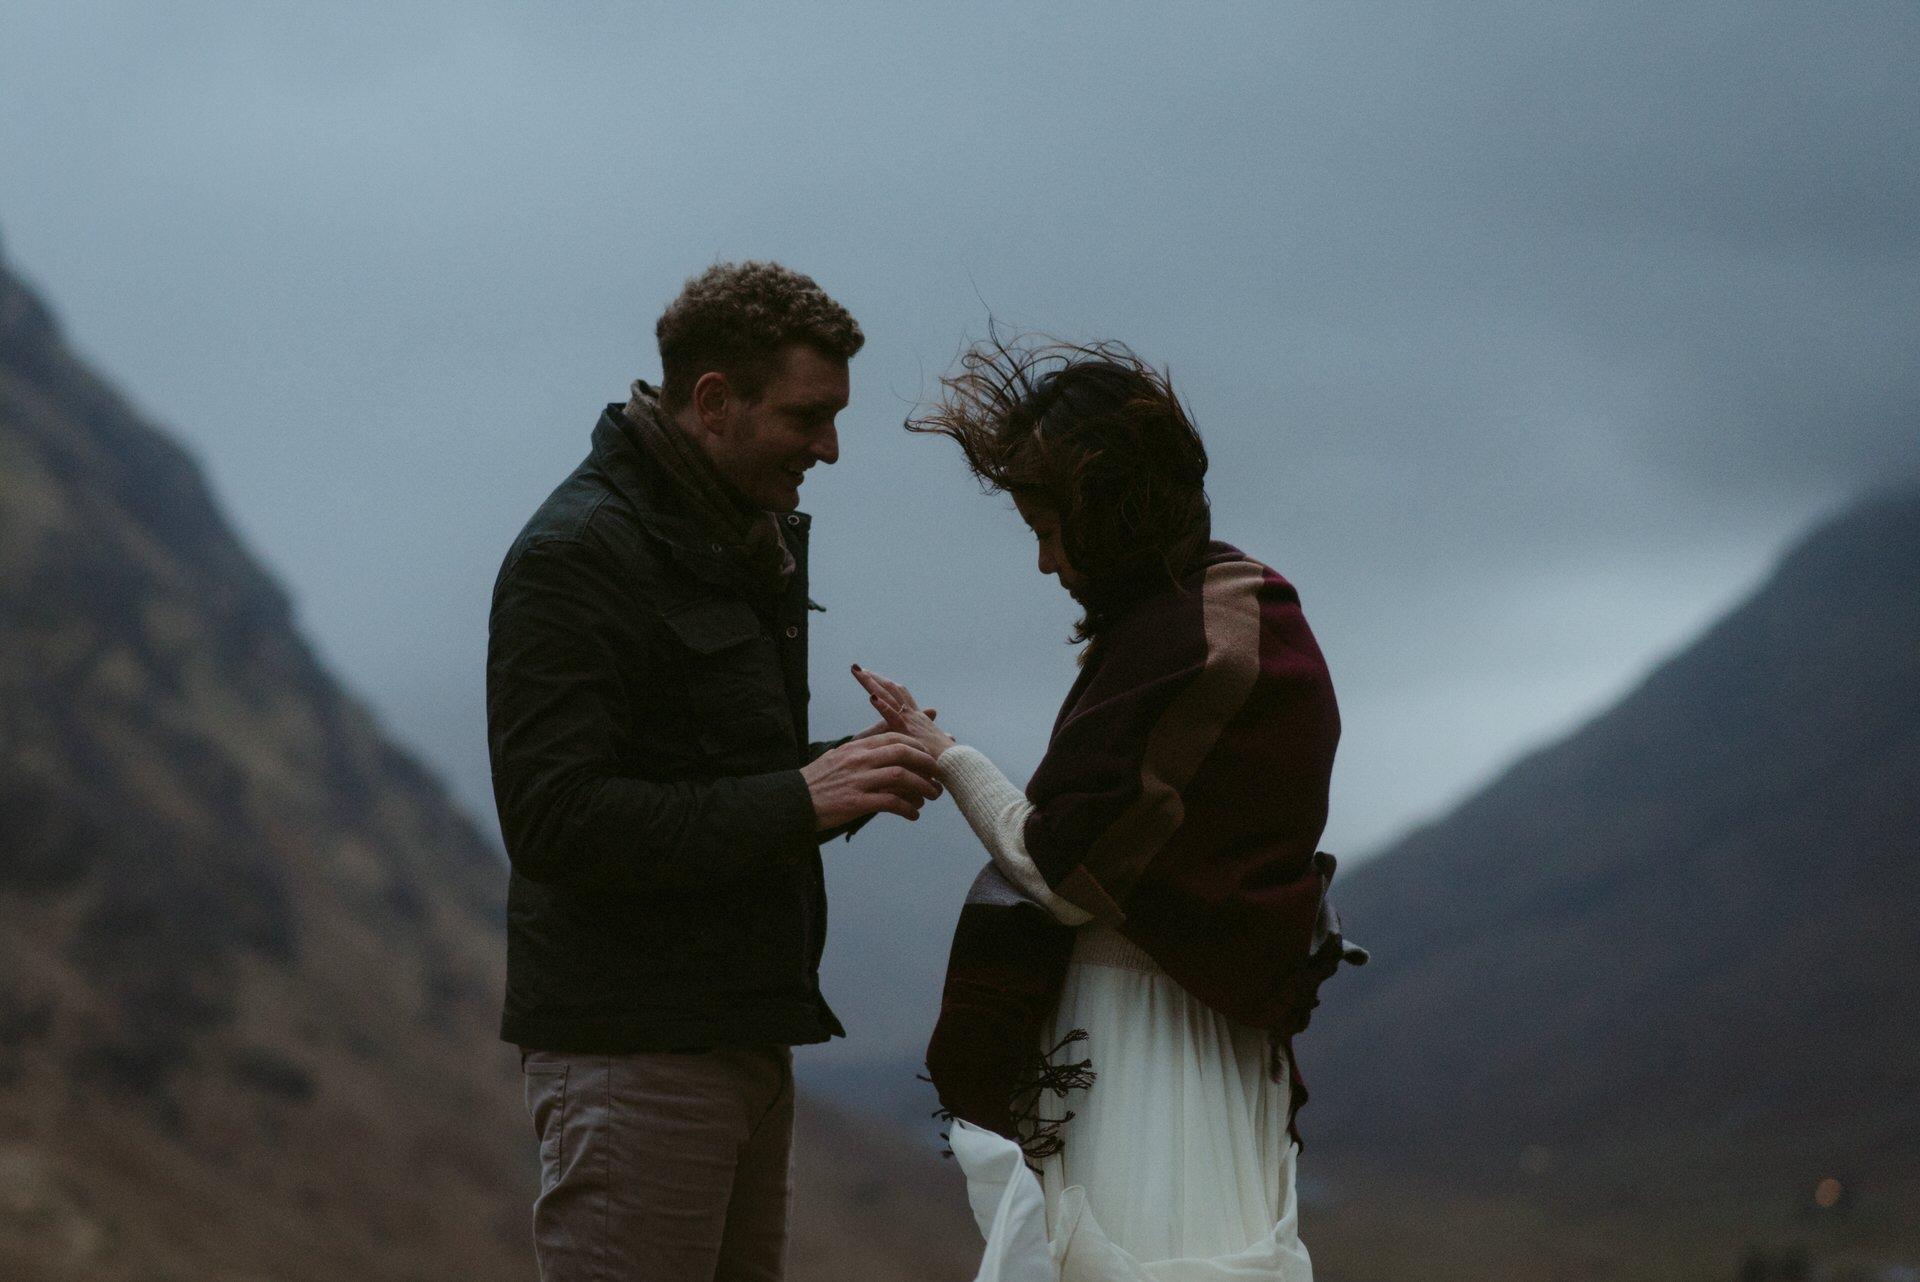 Surprise-Marriage-Proposal-Glencoe_92